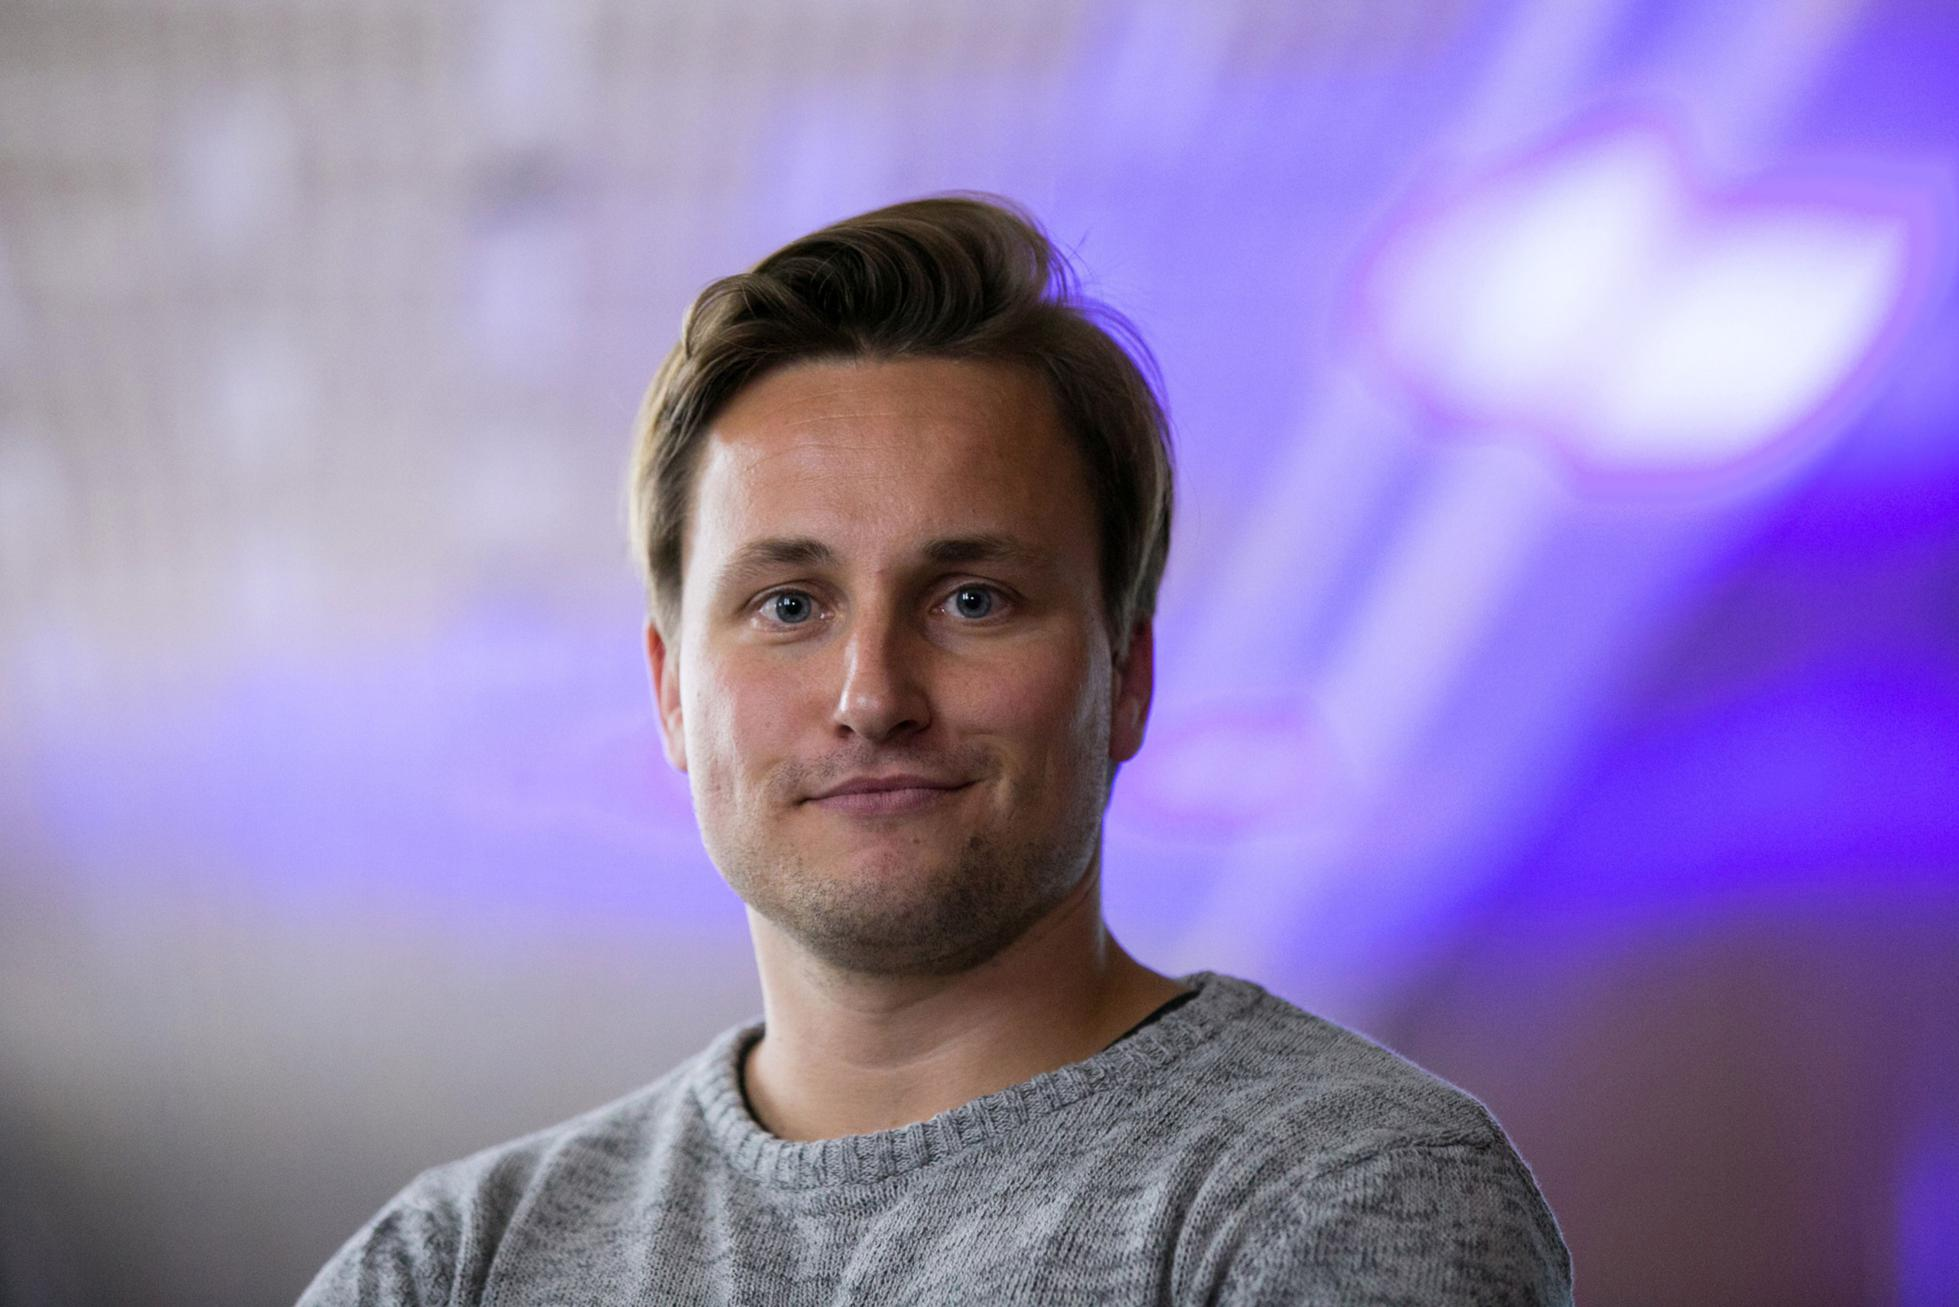 HelloFresh AG Chief Executive Officer Dominik Richter Interview At Tech Open Air Festival